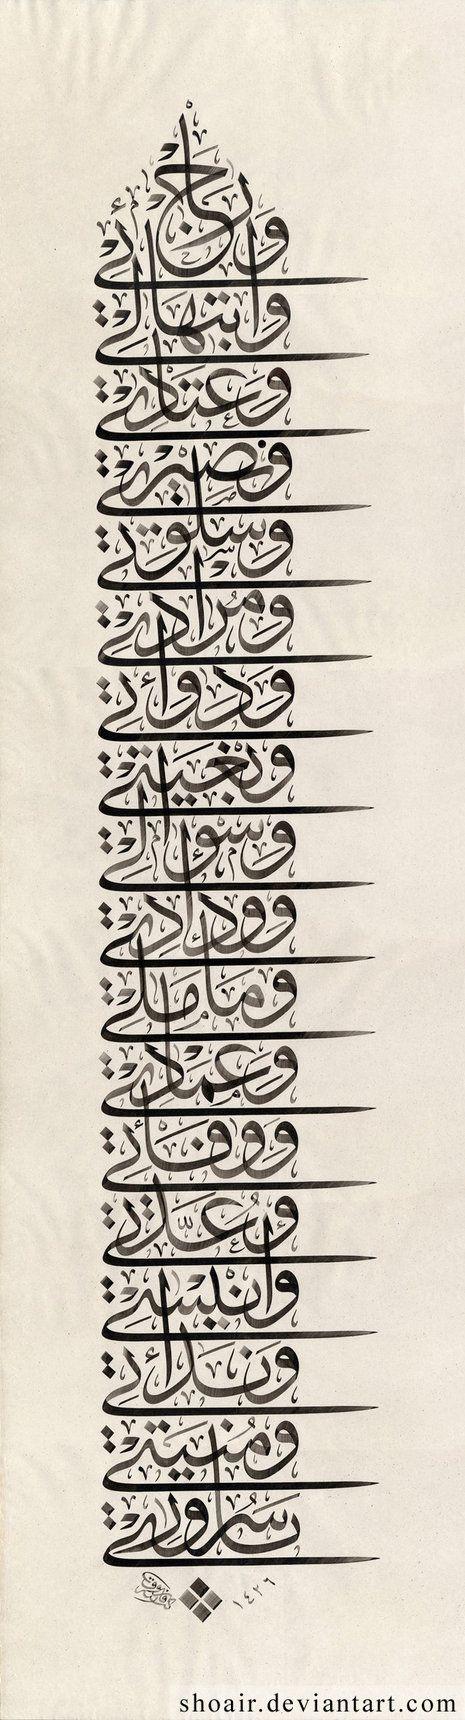 calligrapher Farouk Haddad 5 by ~ACalligraphy on deviantART